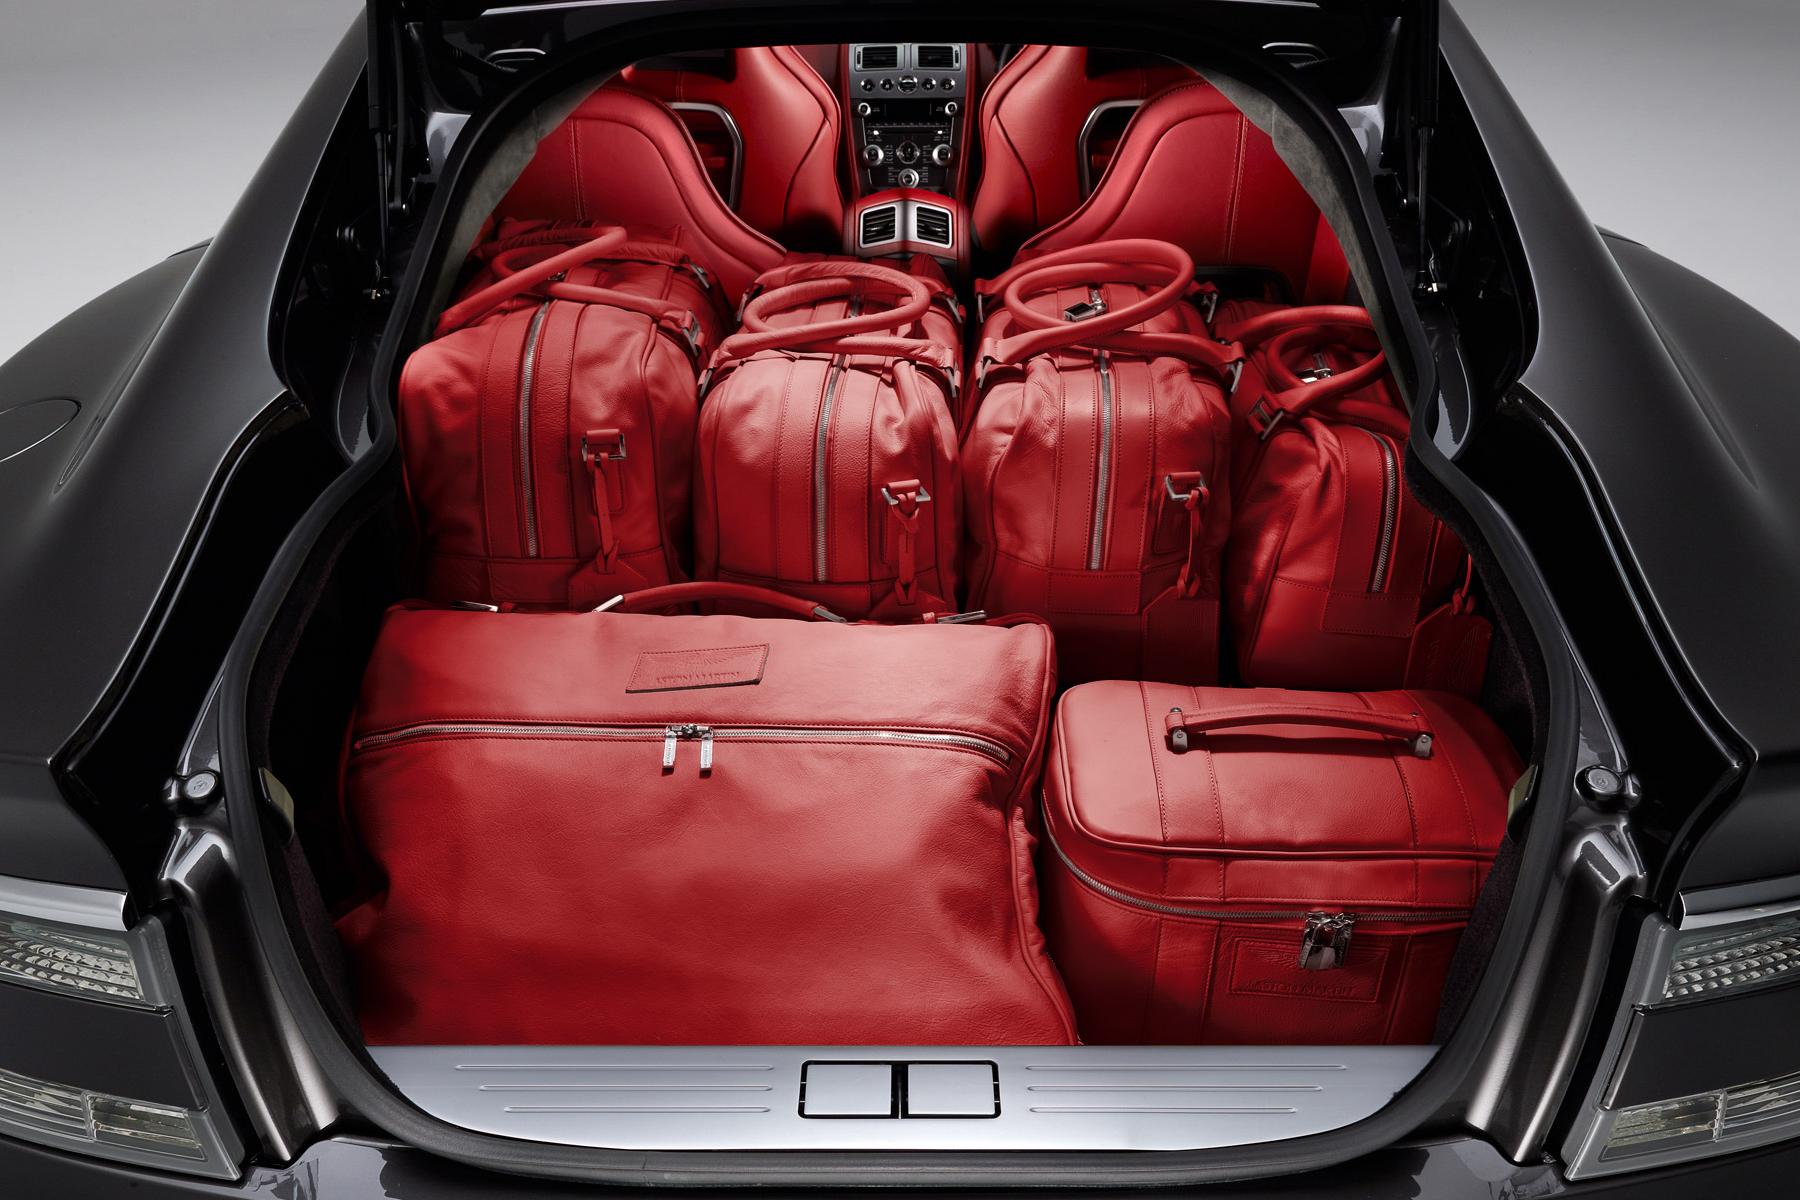 2011 Aston Martin Rapide Luxe Picture 45137